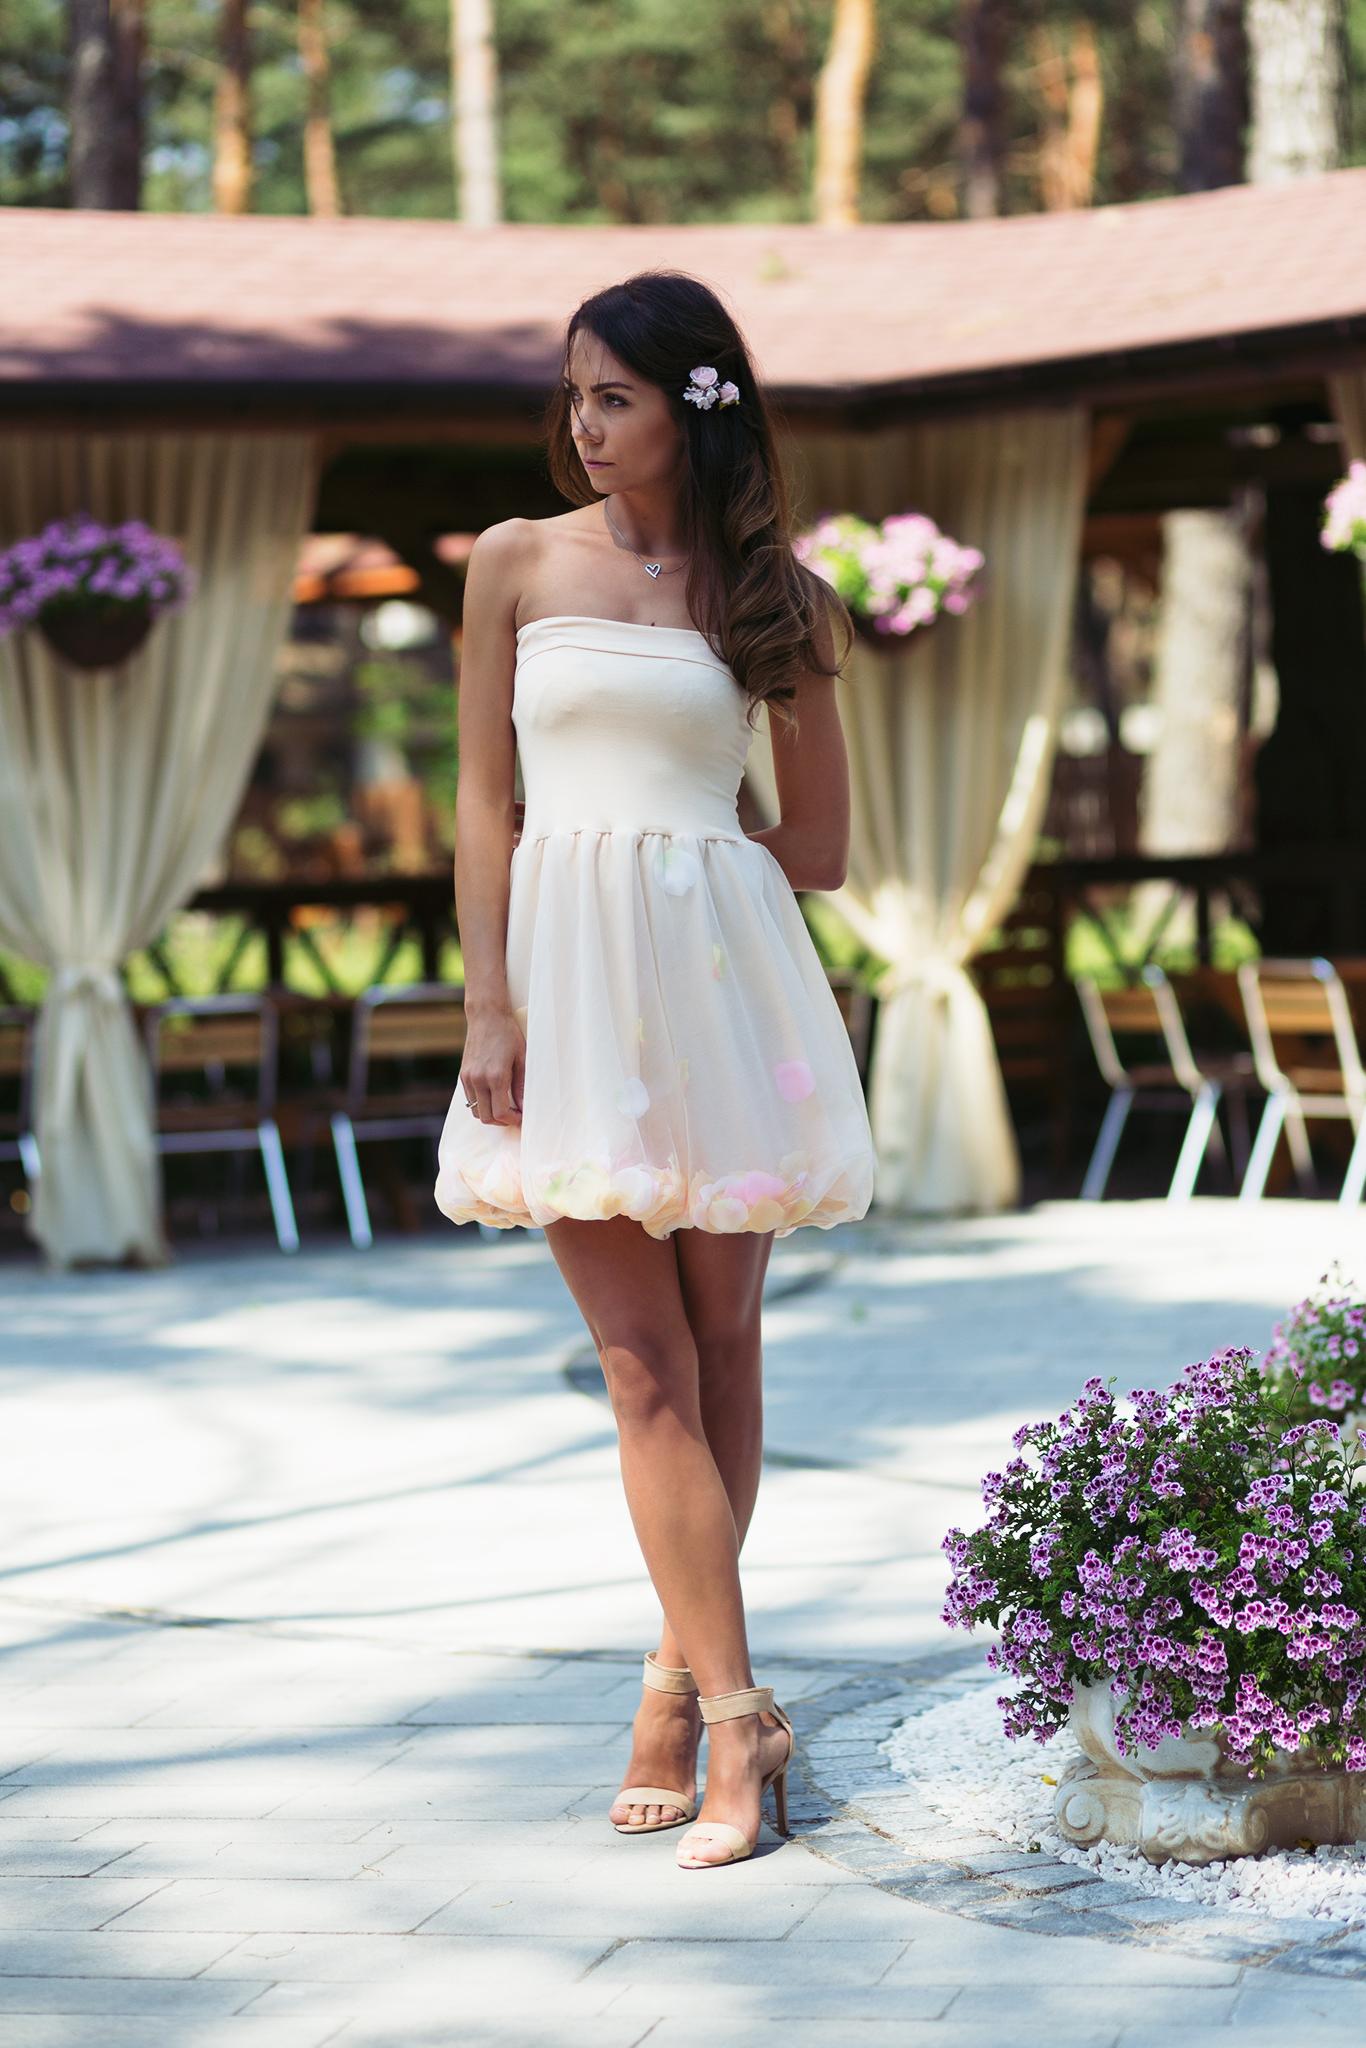 Sukienka Na Specjalną Okazję Olivka Blog Mamy I Córki